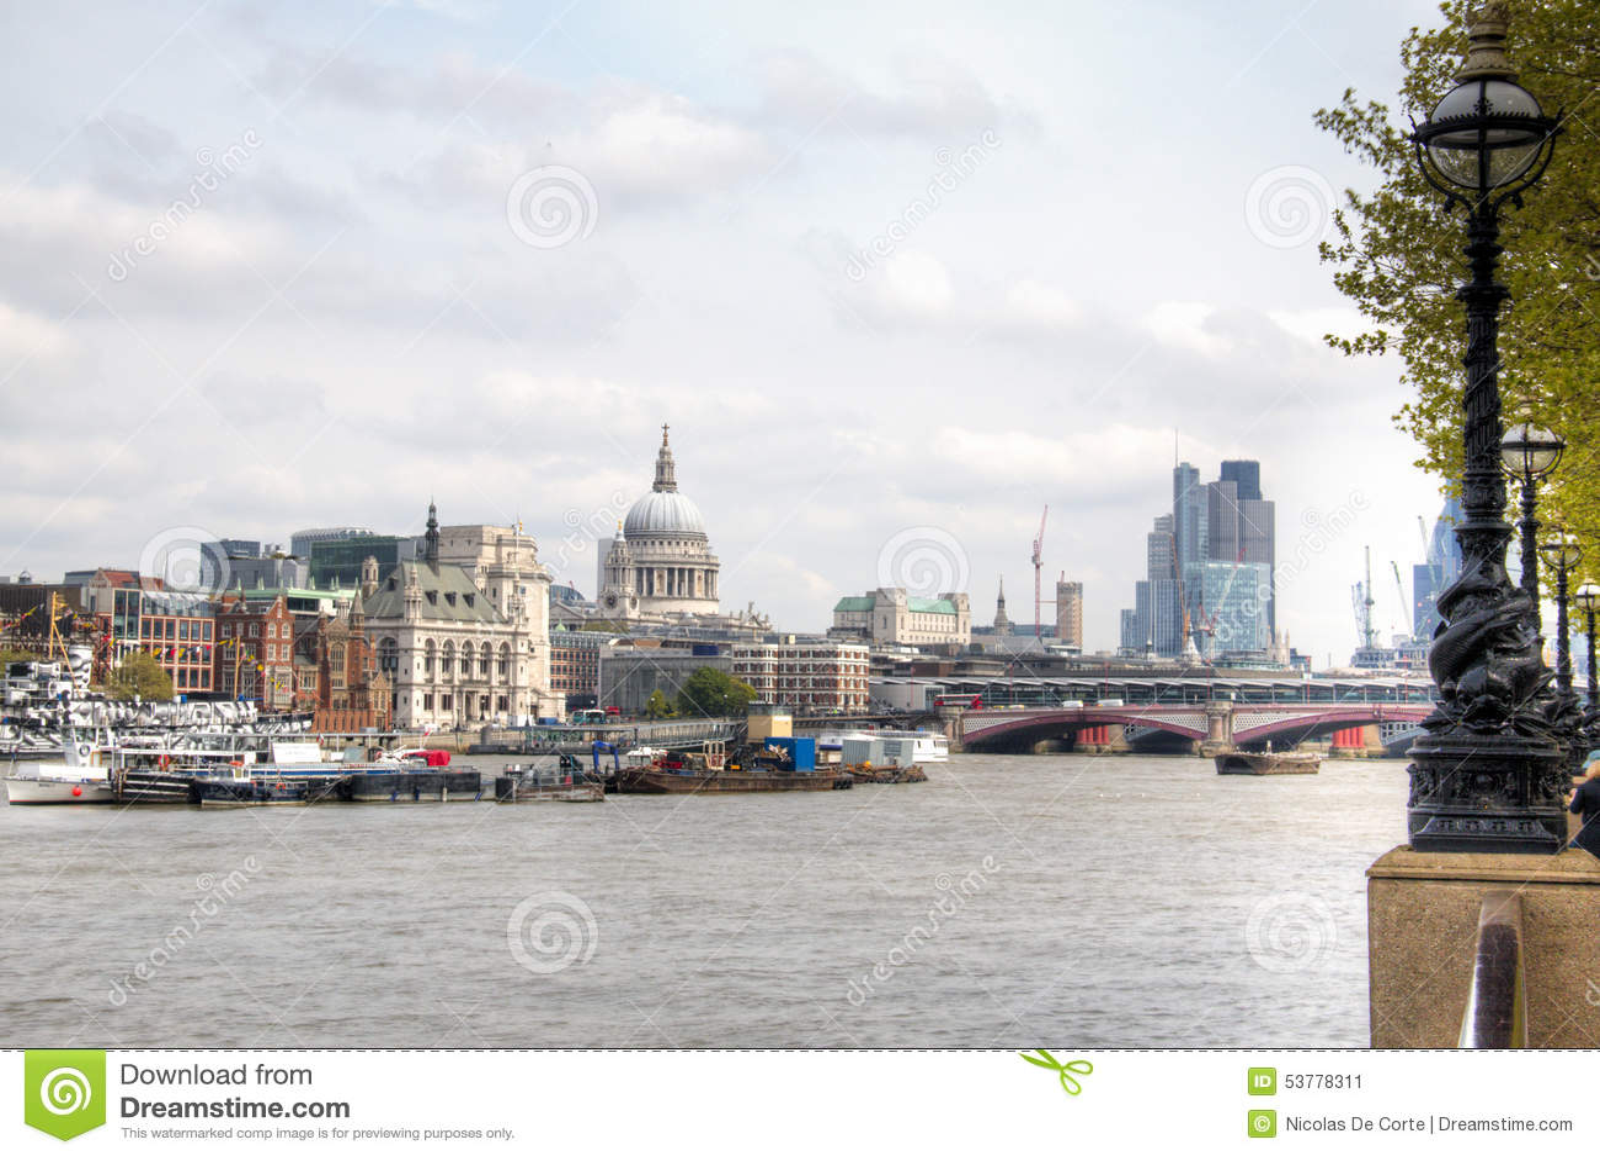 Widok nad Thames z Saint Paul katedrą